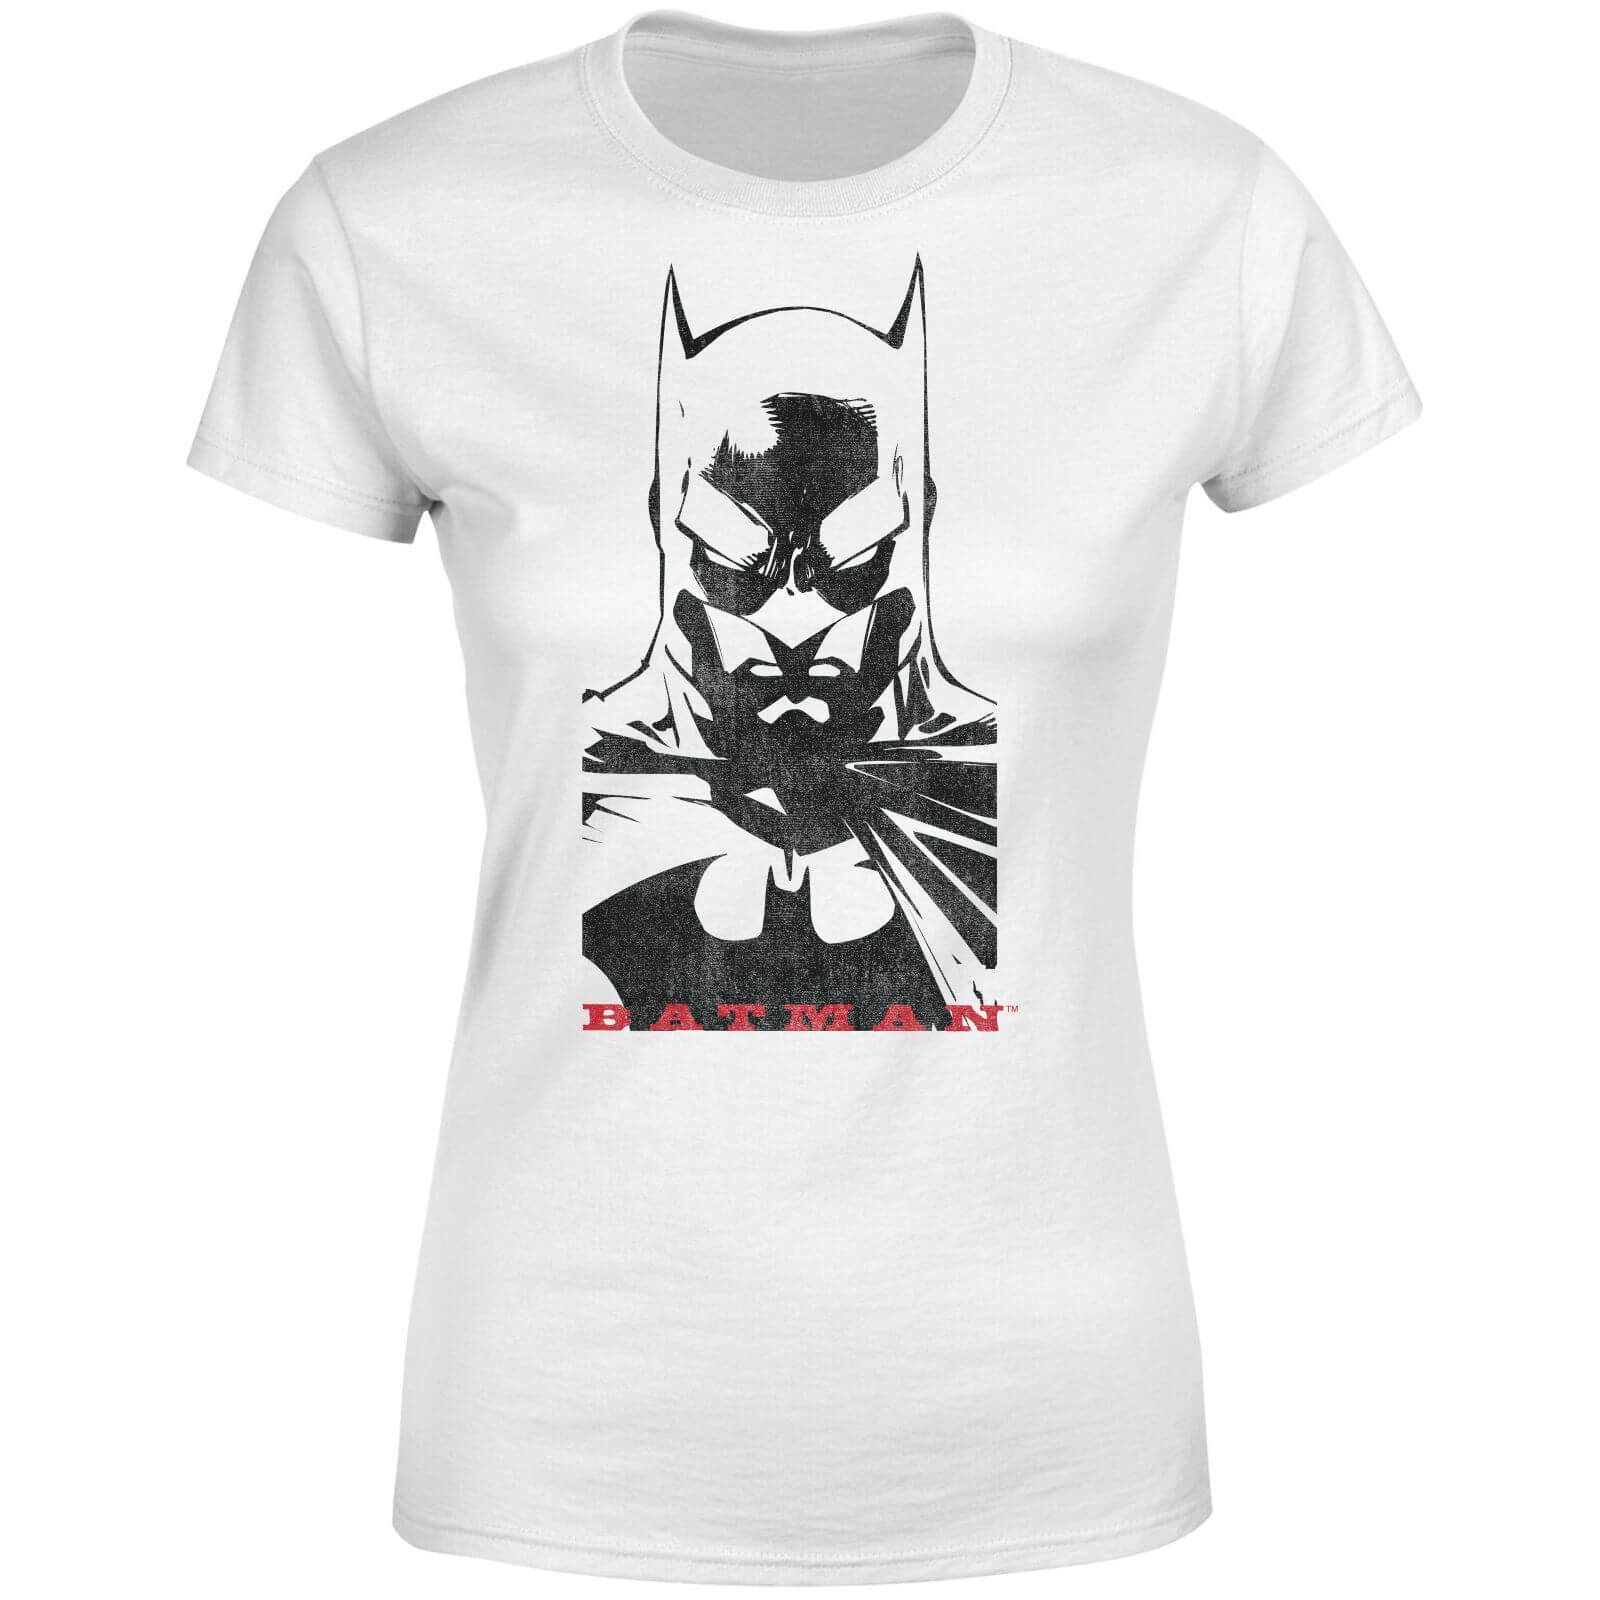 DC Comics Batman Solid Stare Women's T-Shirt - White -  DC Comics Batman Solid Stare Women's T-Sh